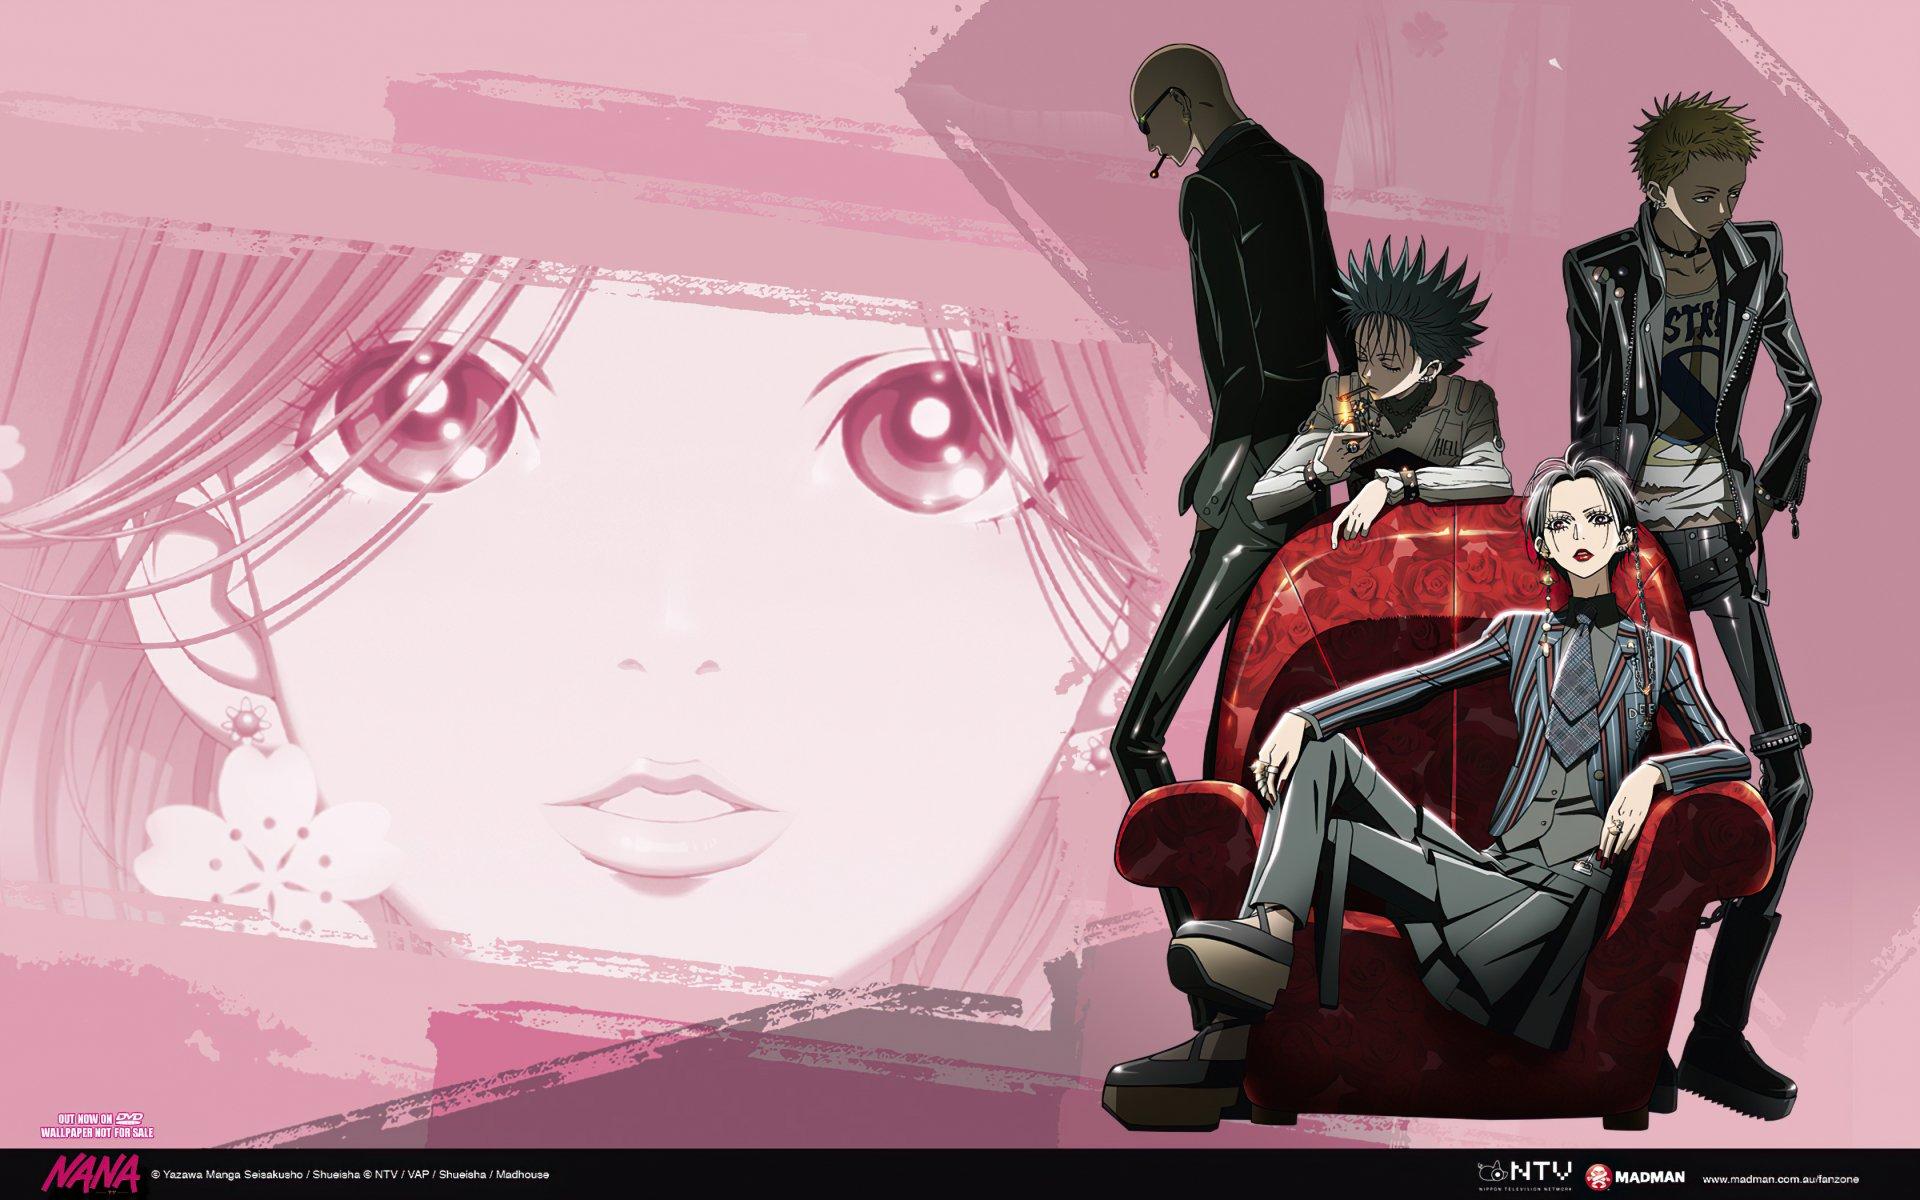 Nana Anime Wallpaper Nana Wallpaper And Background Image 1680x1050 Id 232495